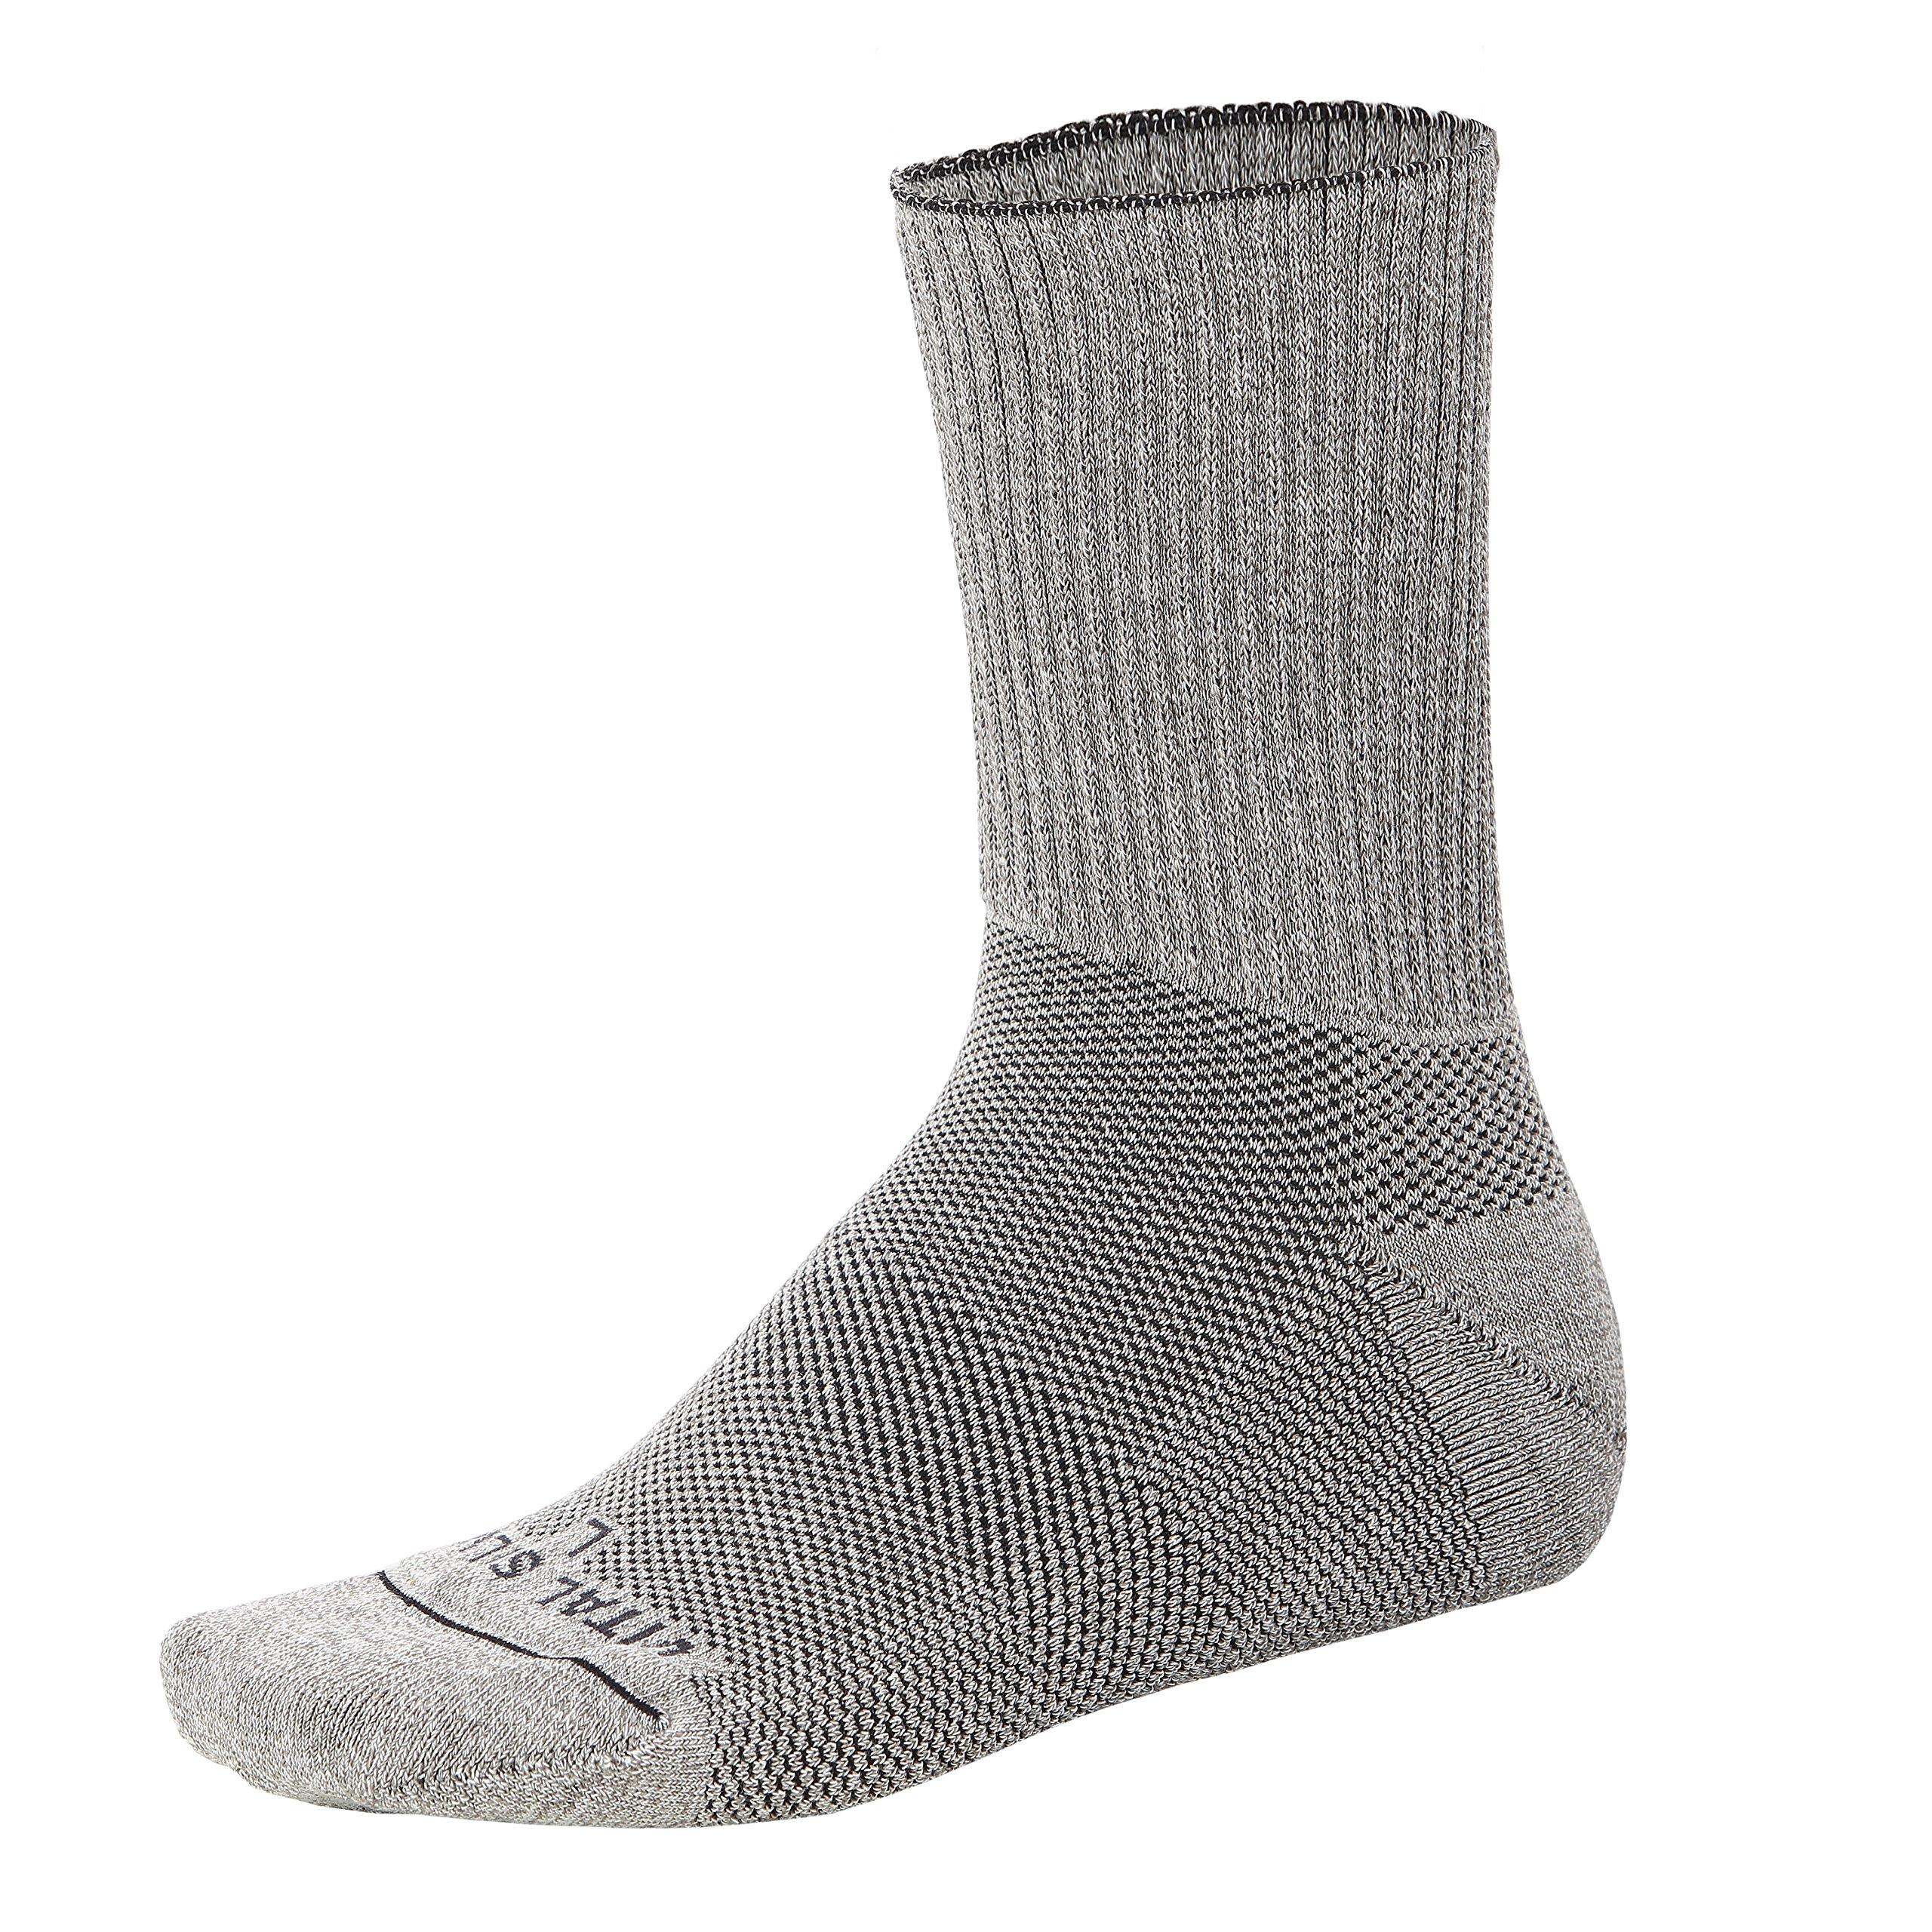 Vital Salveo – Diabetic Socks with Germanium and Bamboo Charcoal Soft Cushion Socks, Non-Binding Top, Seamless Toe, Circulation Socks- Crew (1 pair) L